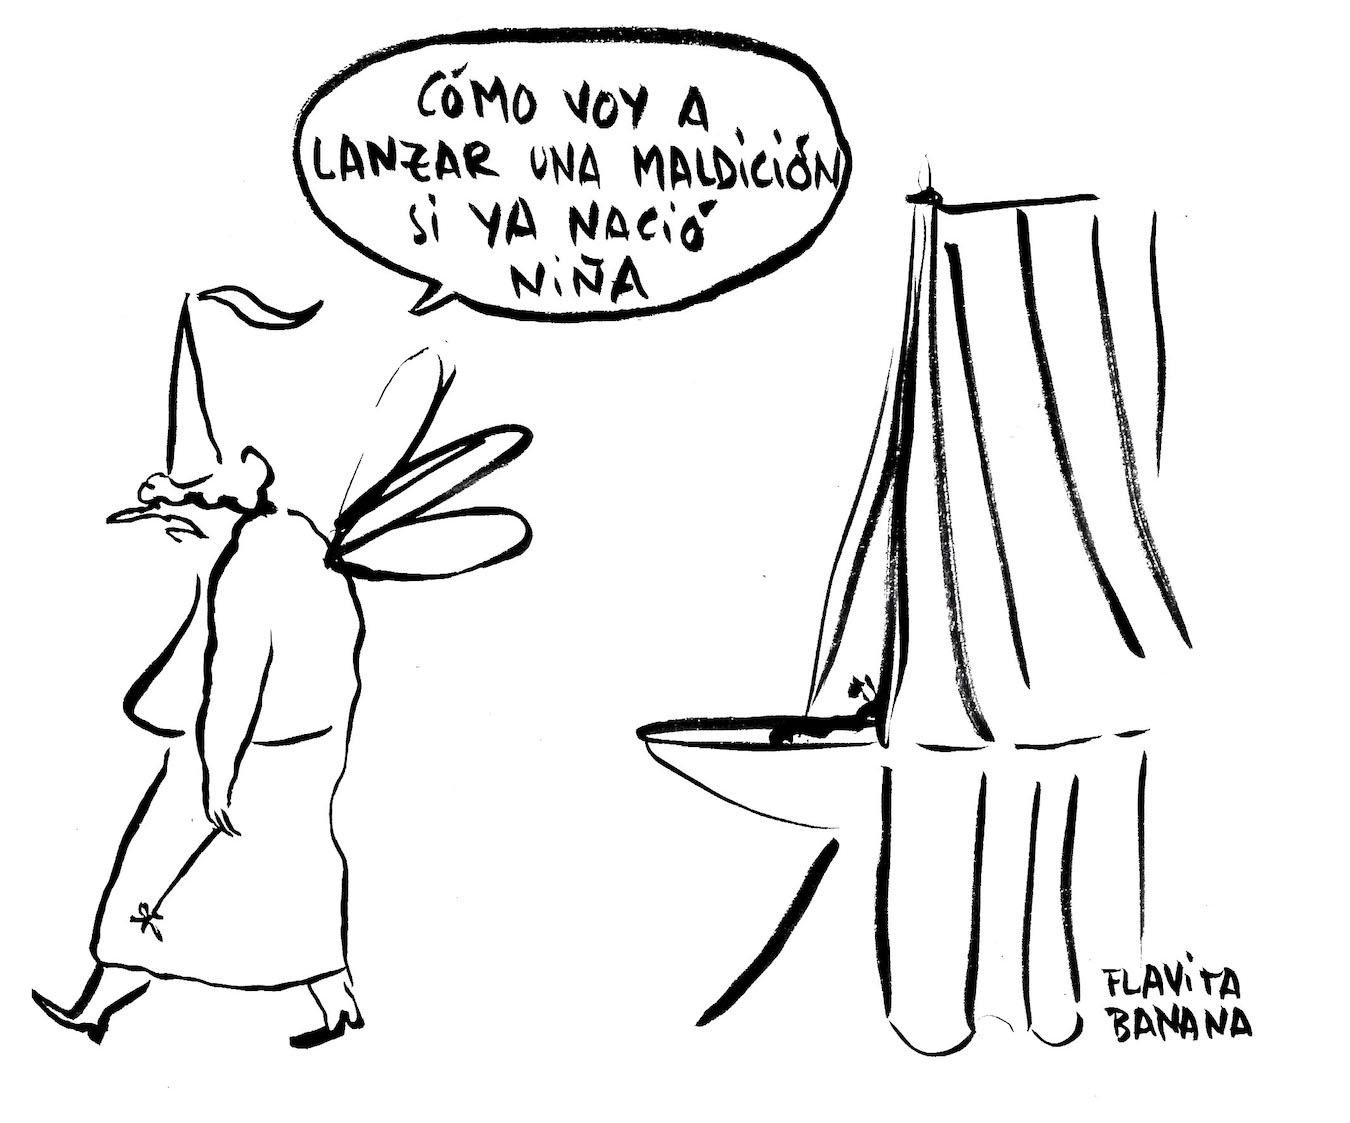 Flavita Banana, disparando viñetas